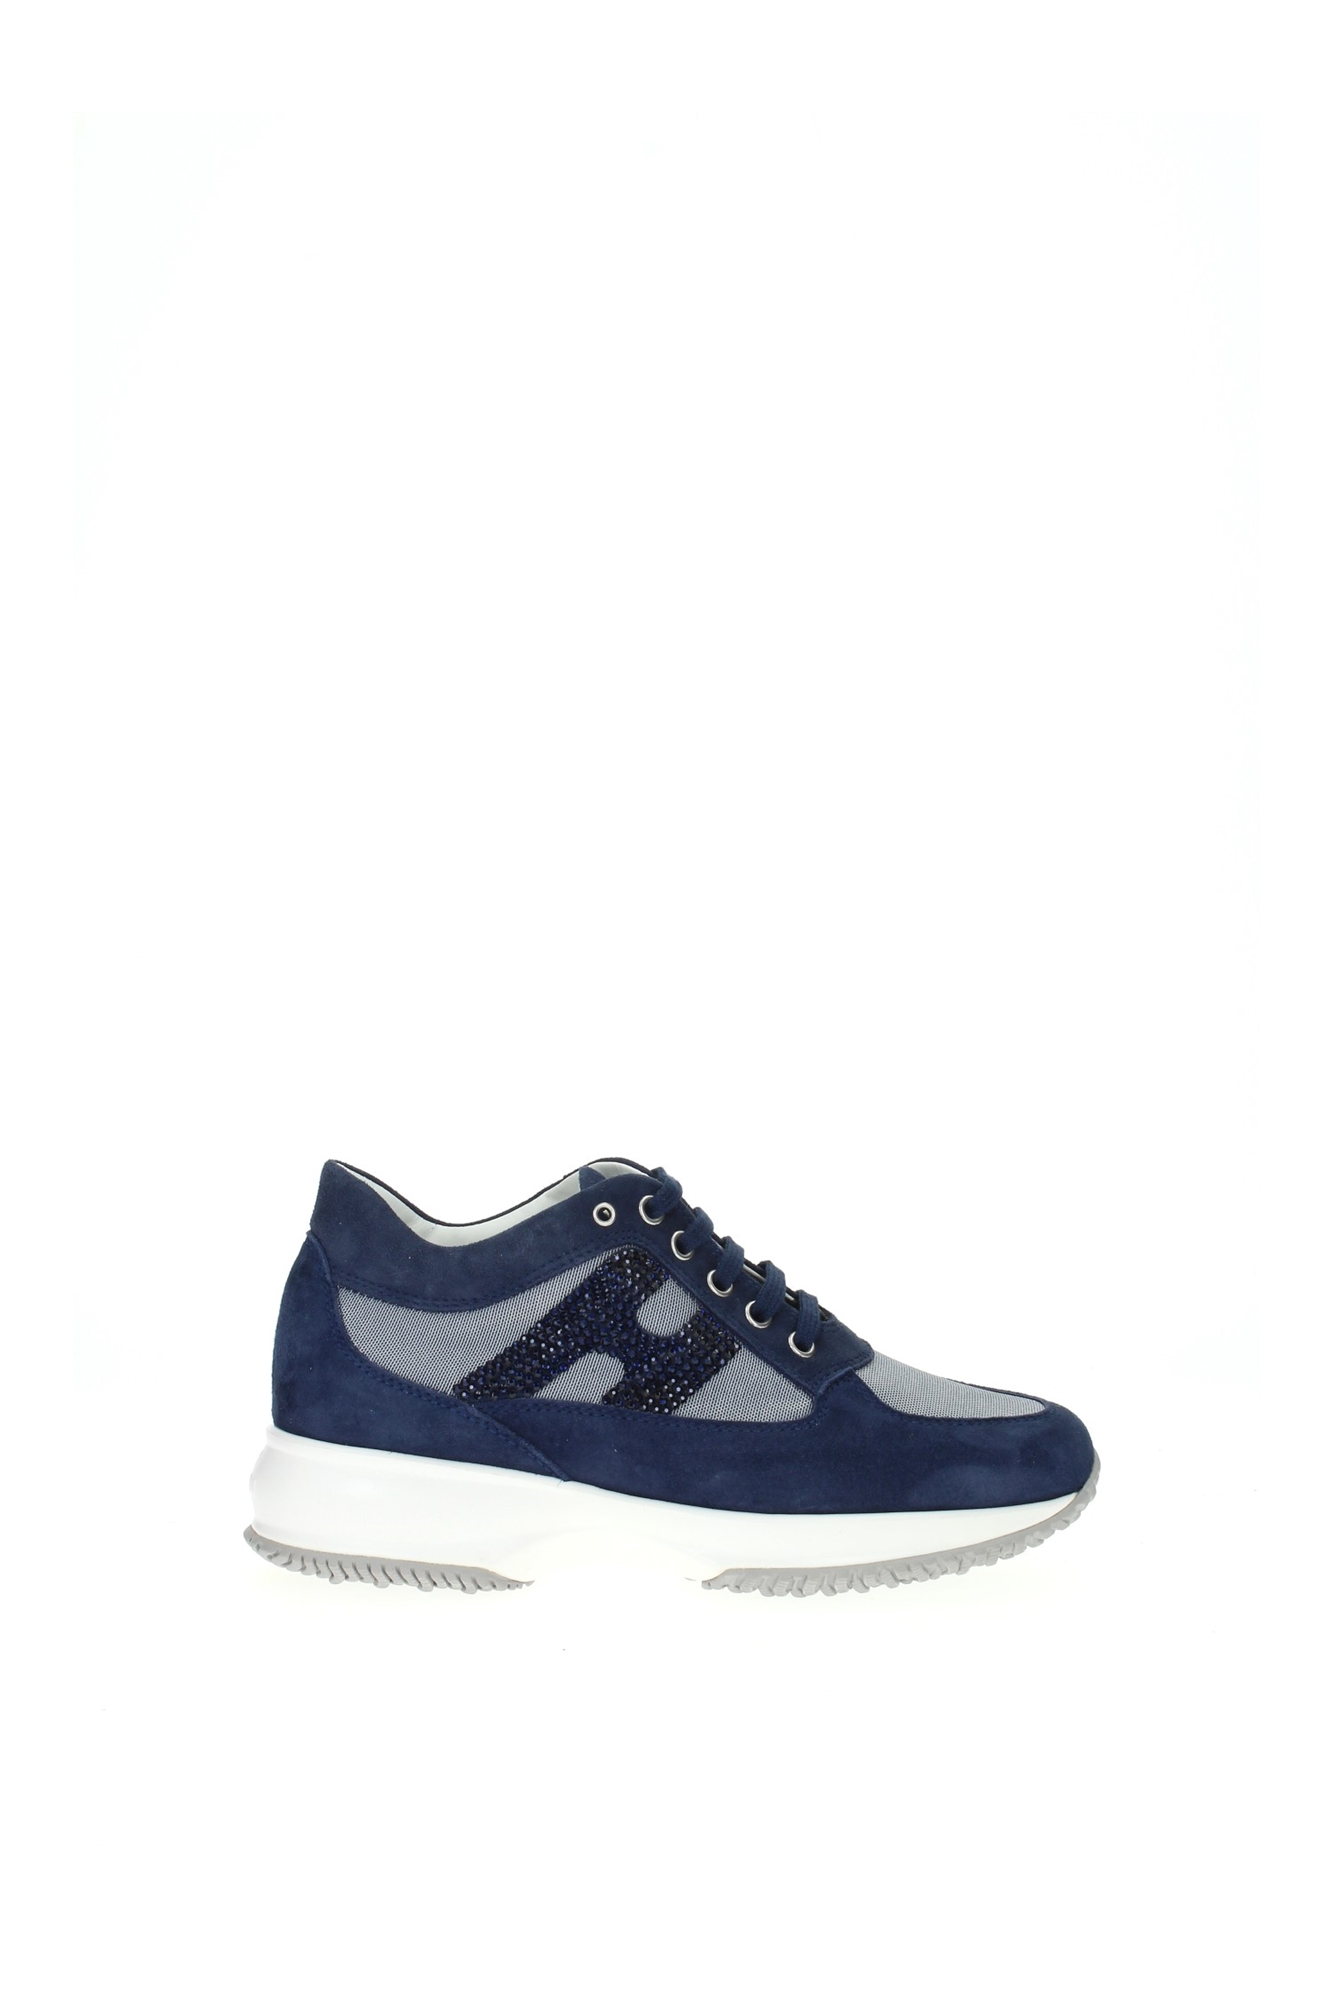 sneakers hogan damen wildleder blau hxw00n020118sju800 ebay. Black Bedroom Furniture Sets. Home Design Ideas